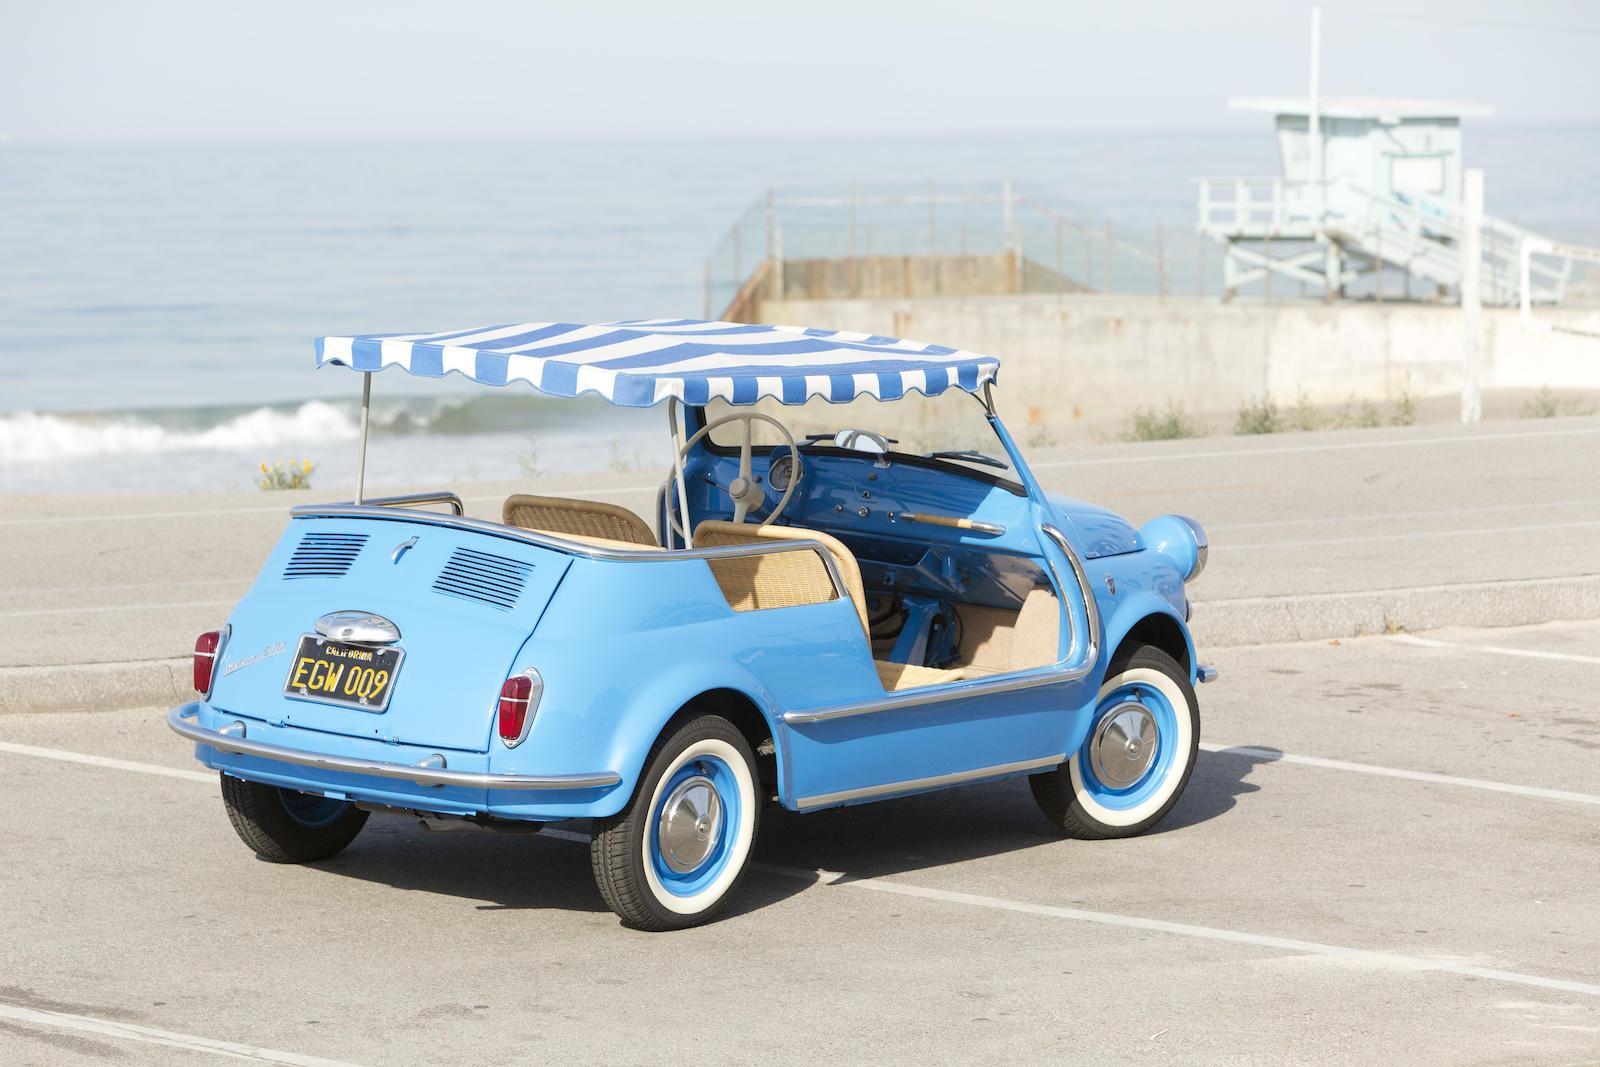 1959 Fiat Jolly rear 3/4 high